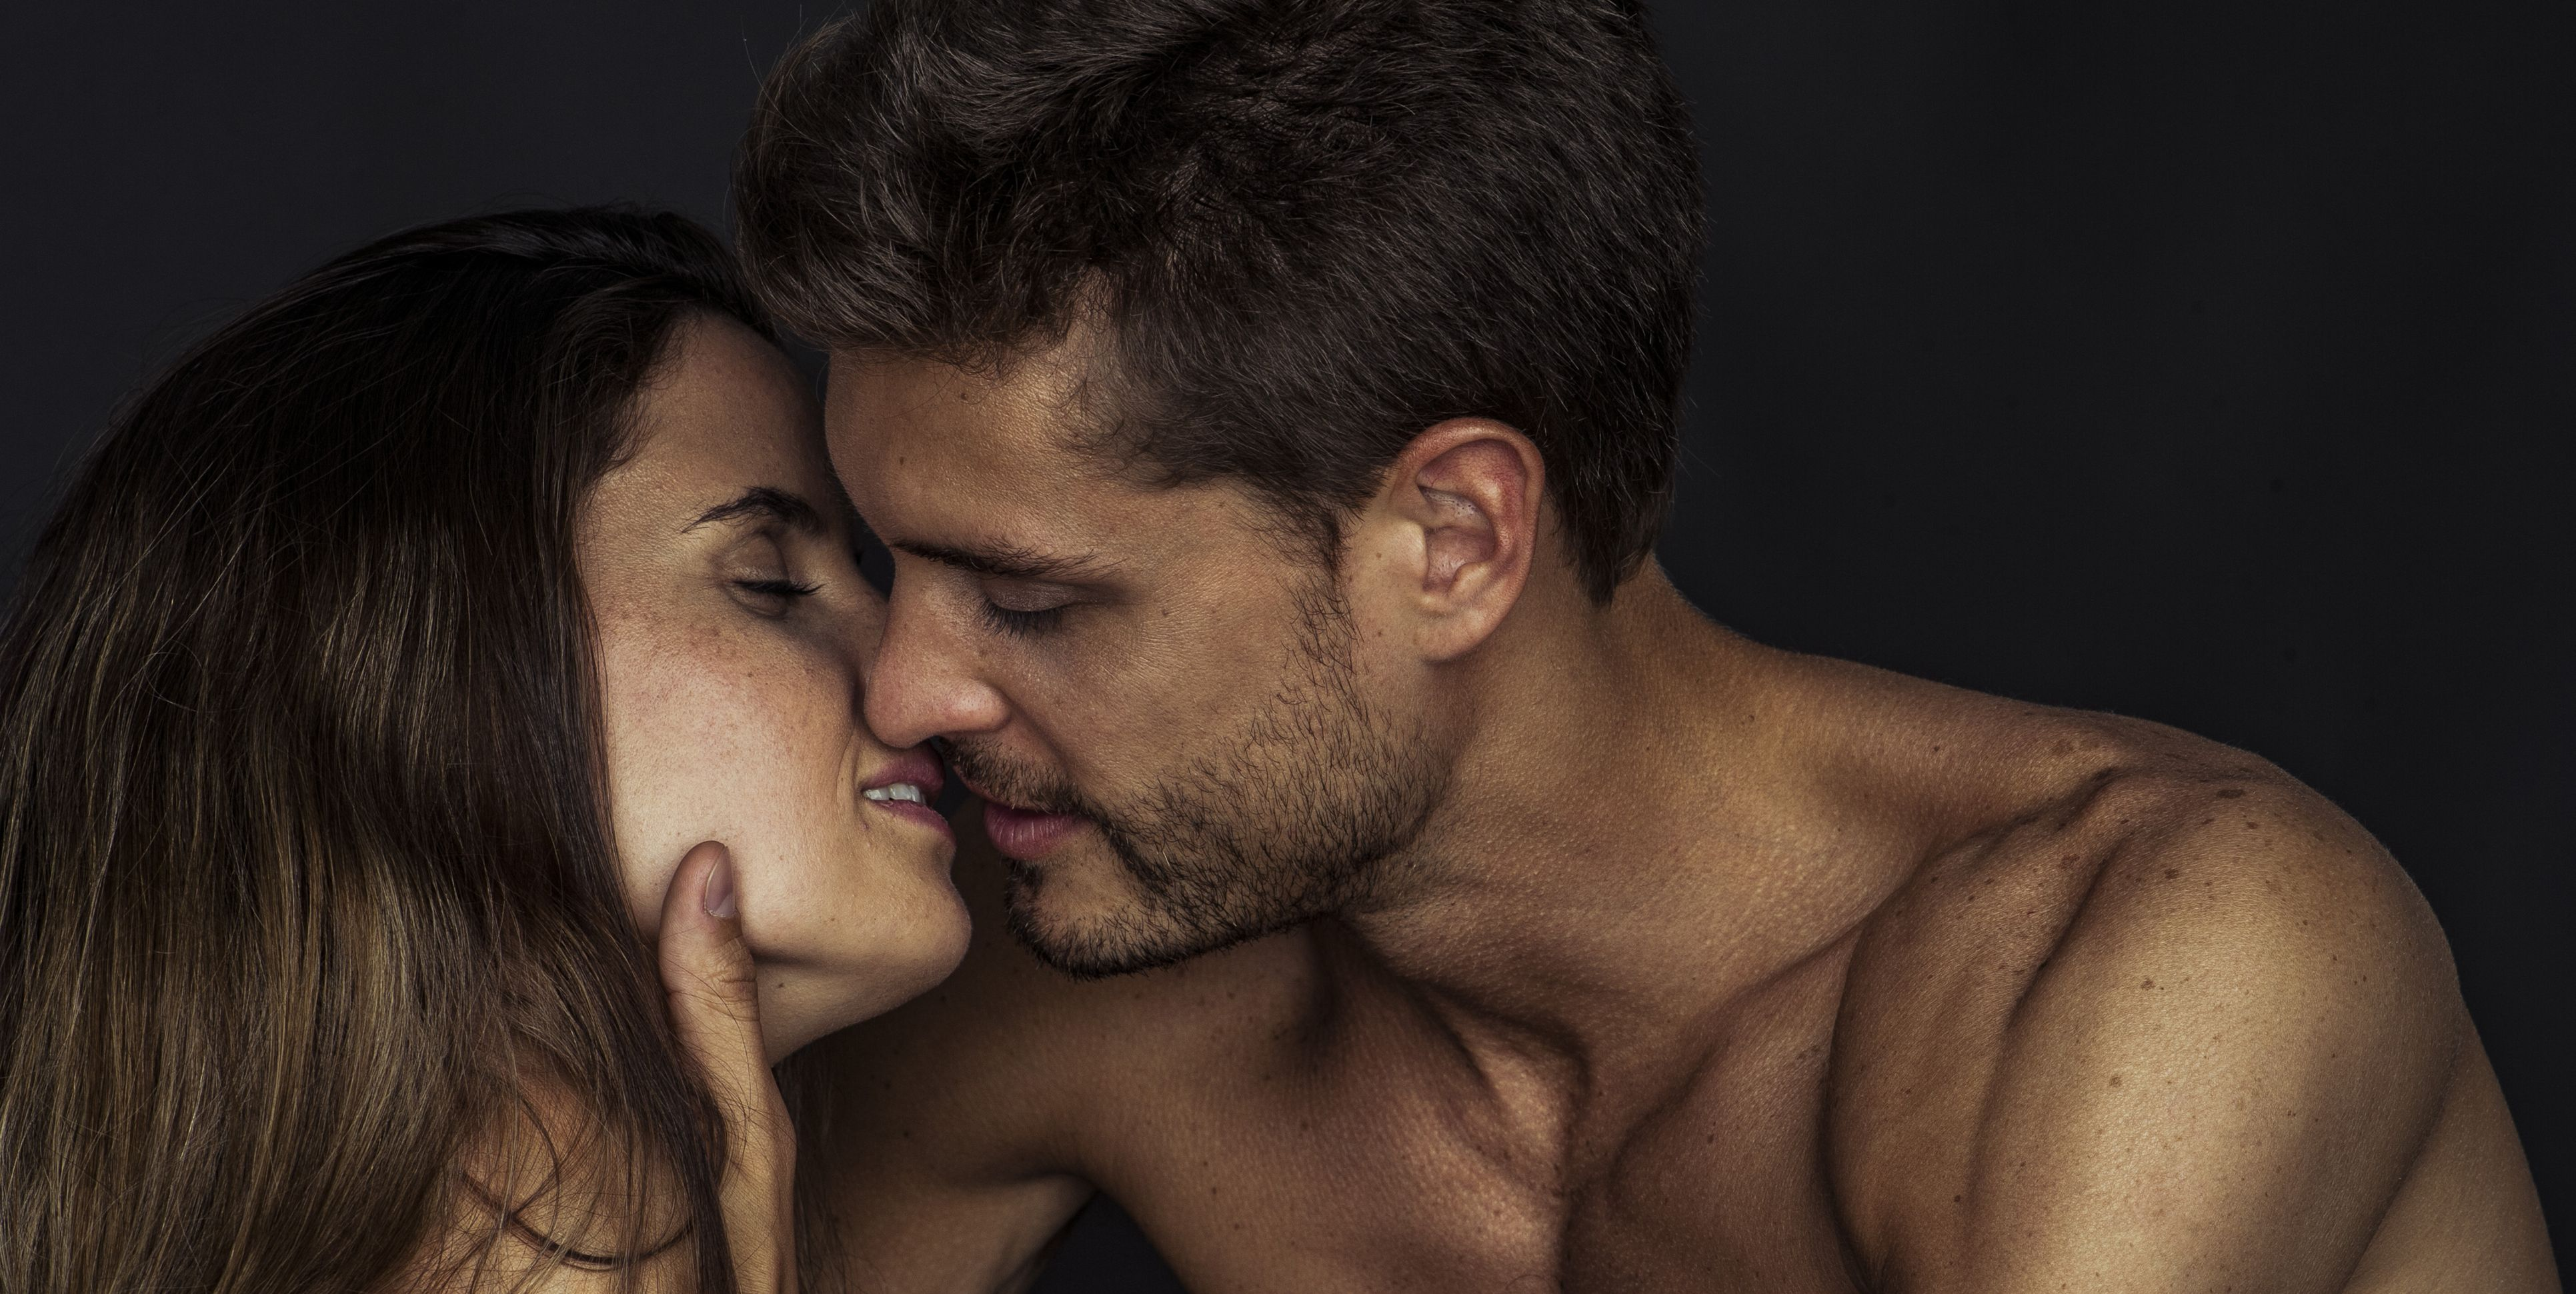 Couple preparing to kiss